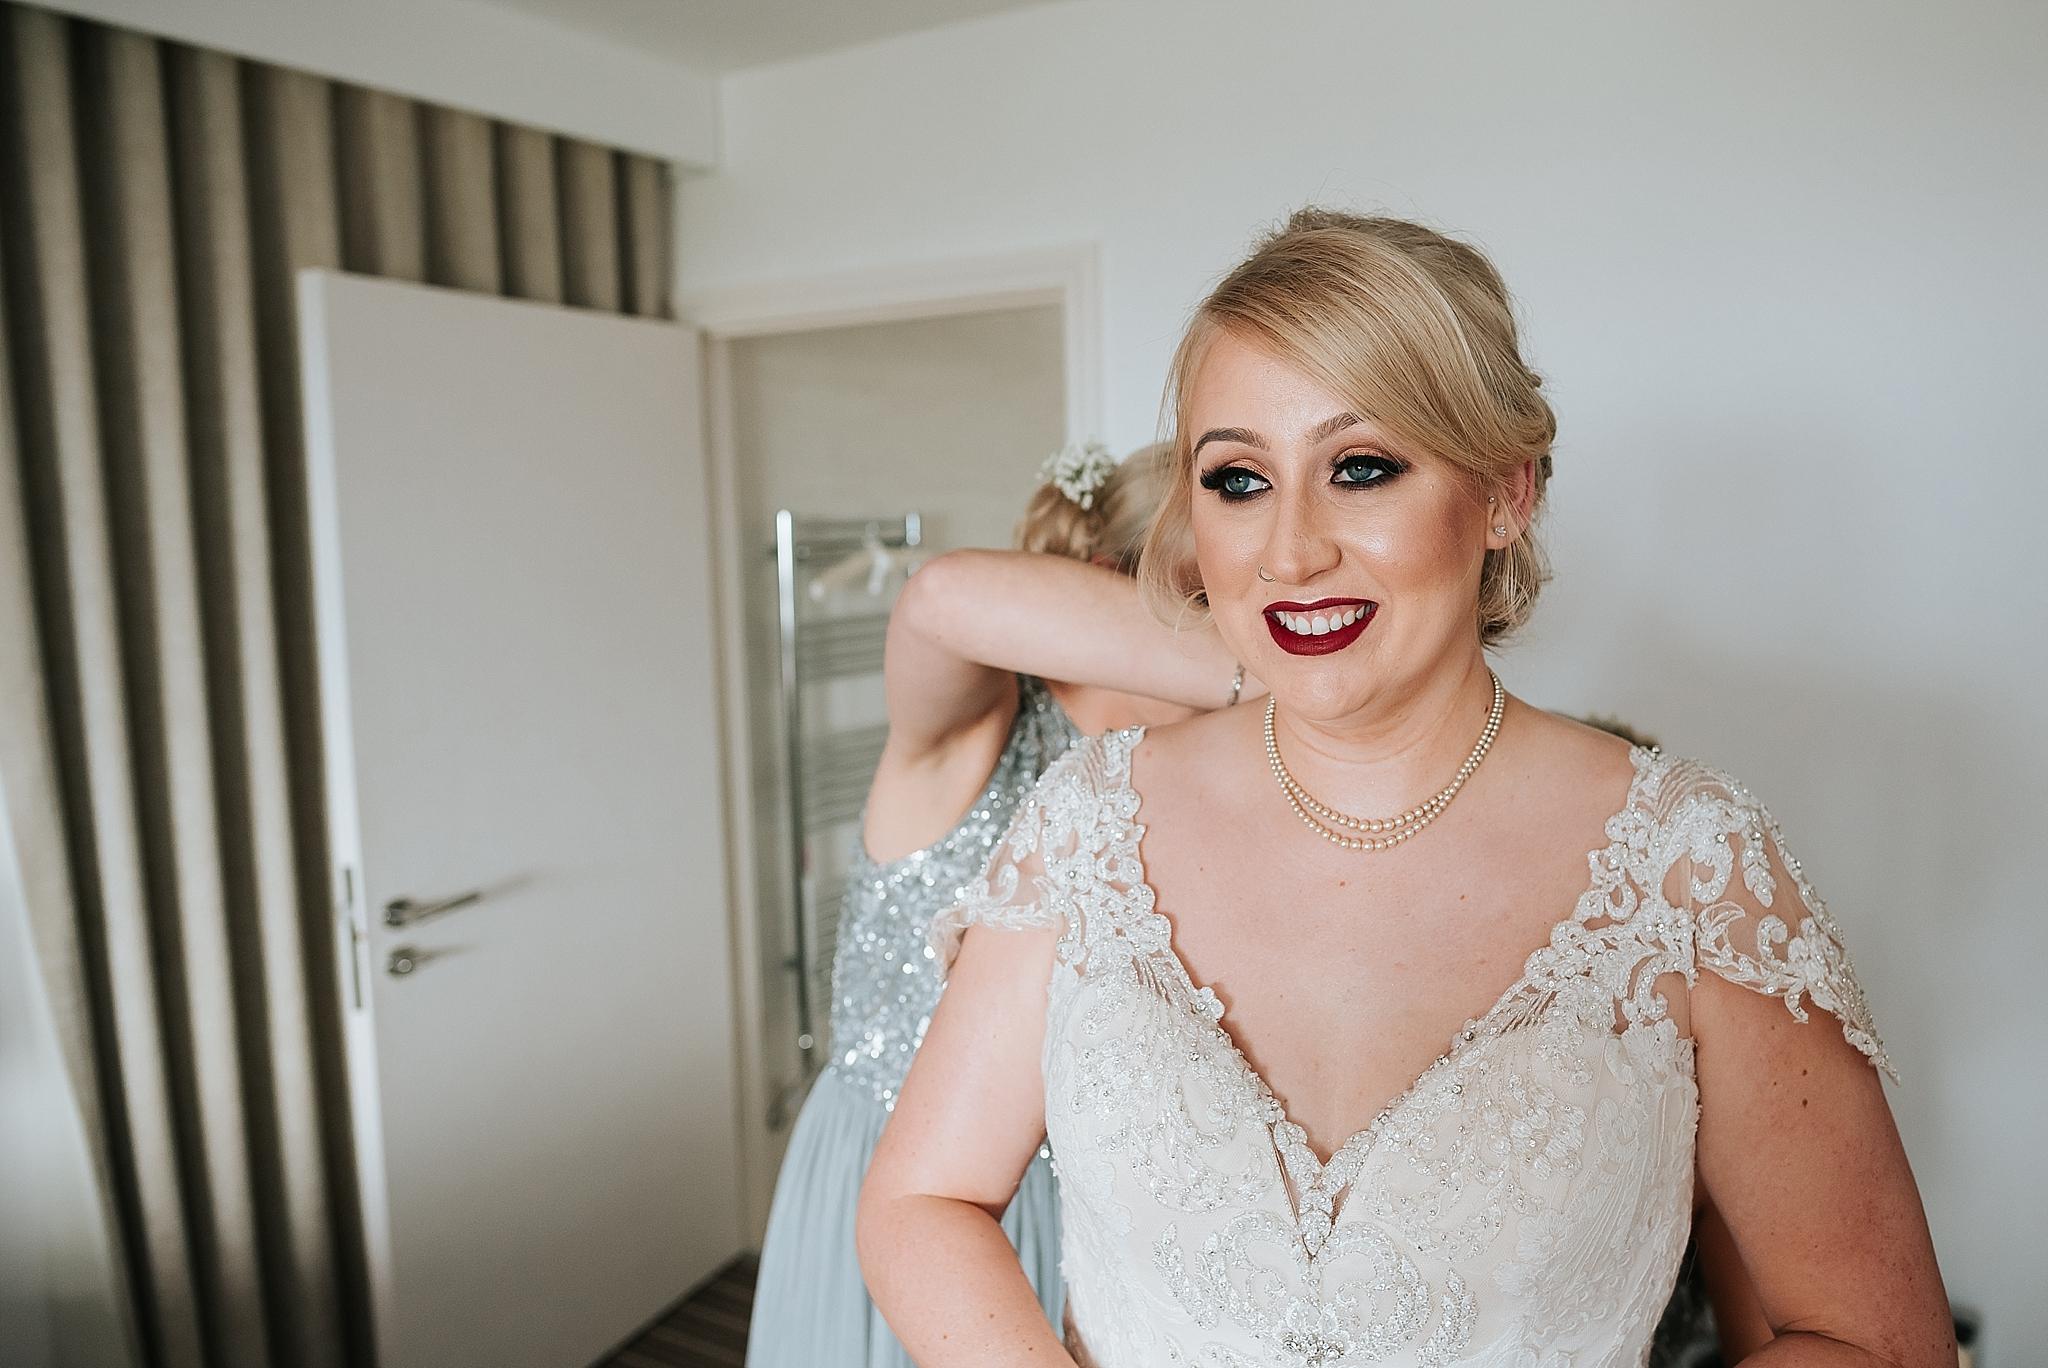 bride getting wedding dress on before wedding